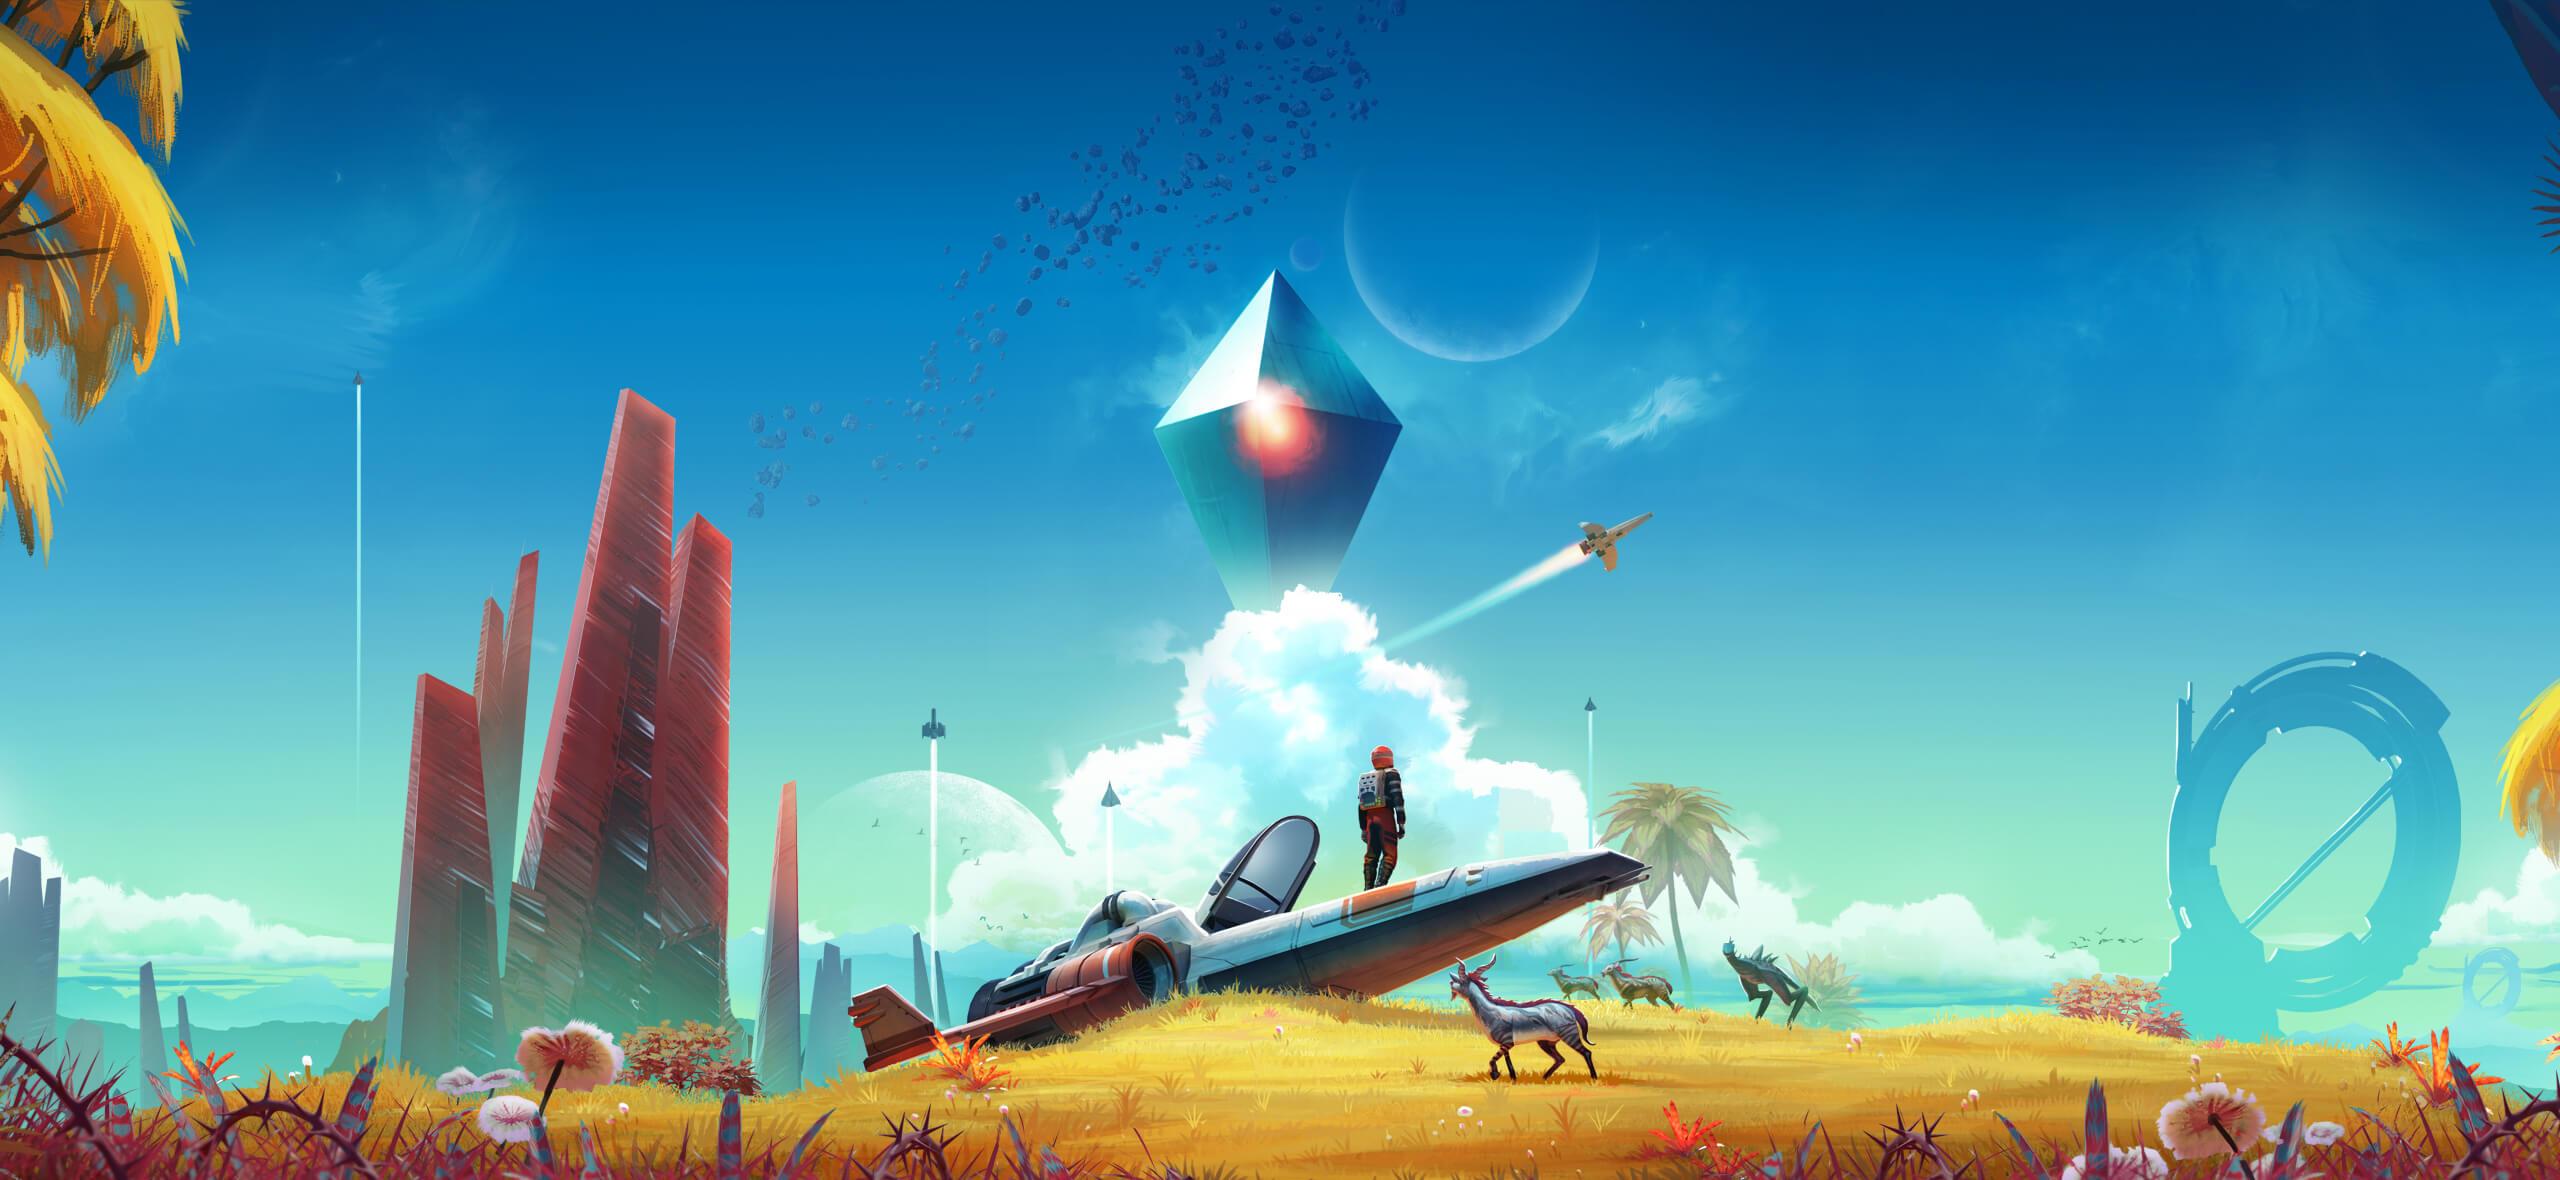 Wallpaper 2560x1180 Px No Mans Sky Pc Gaming Spaceship